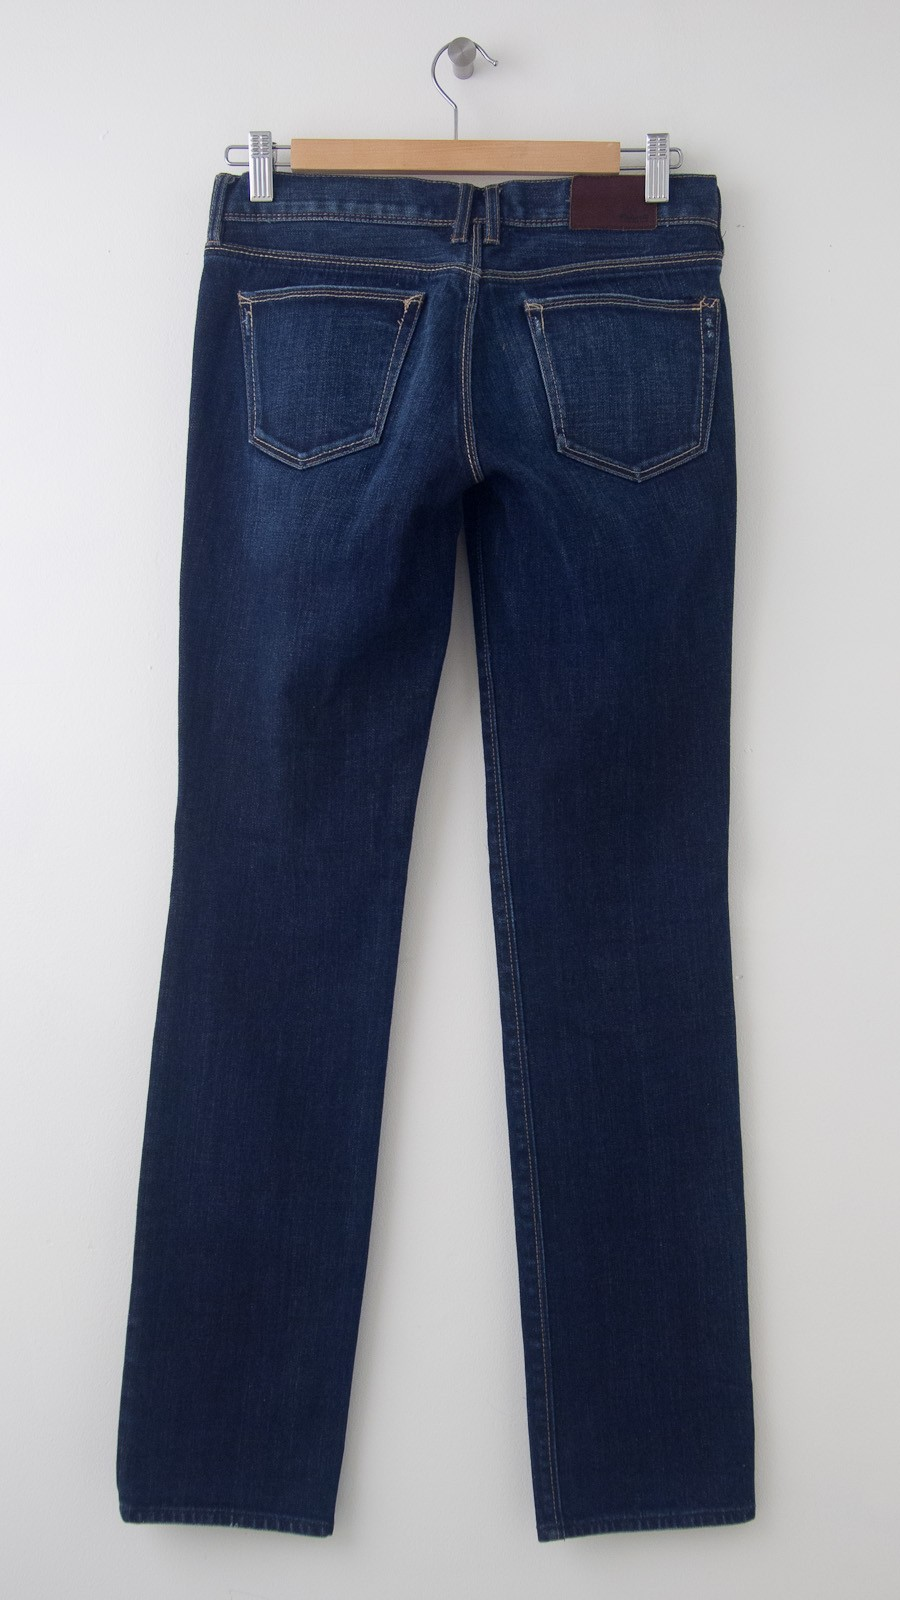 Madewell Rail Straight Jeans Women S 25